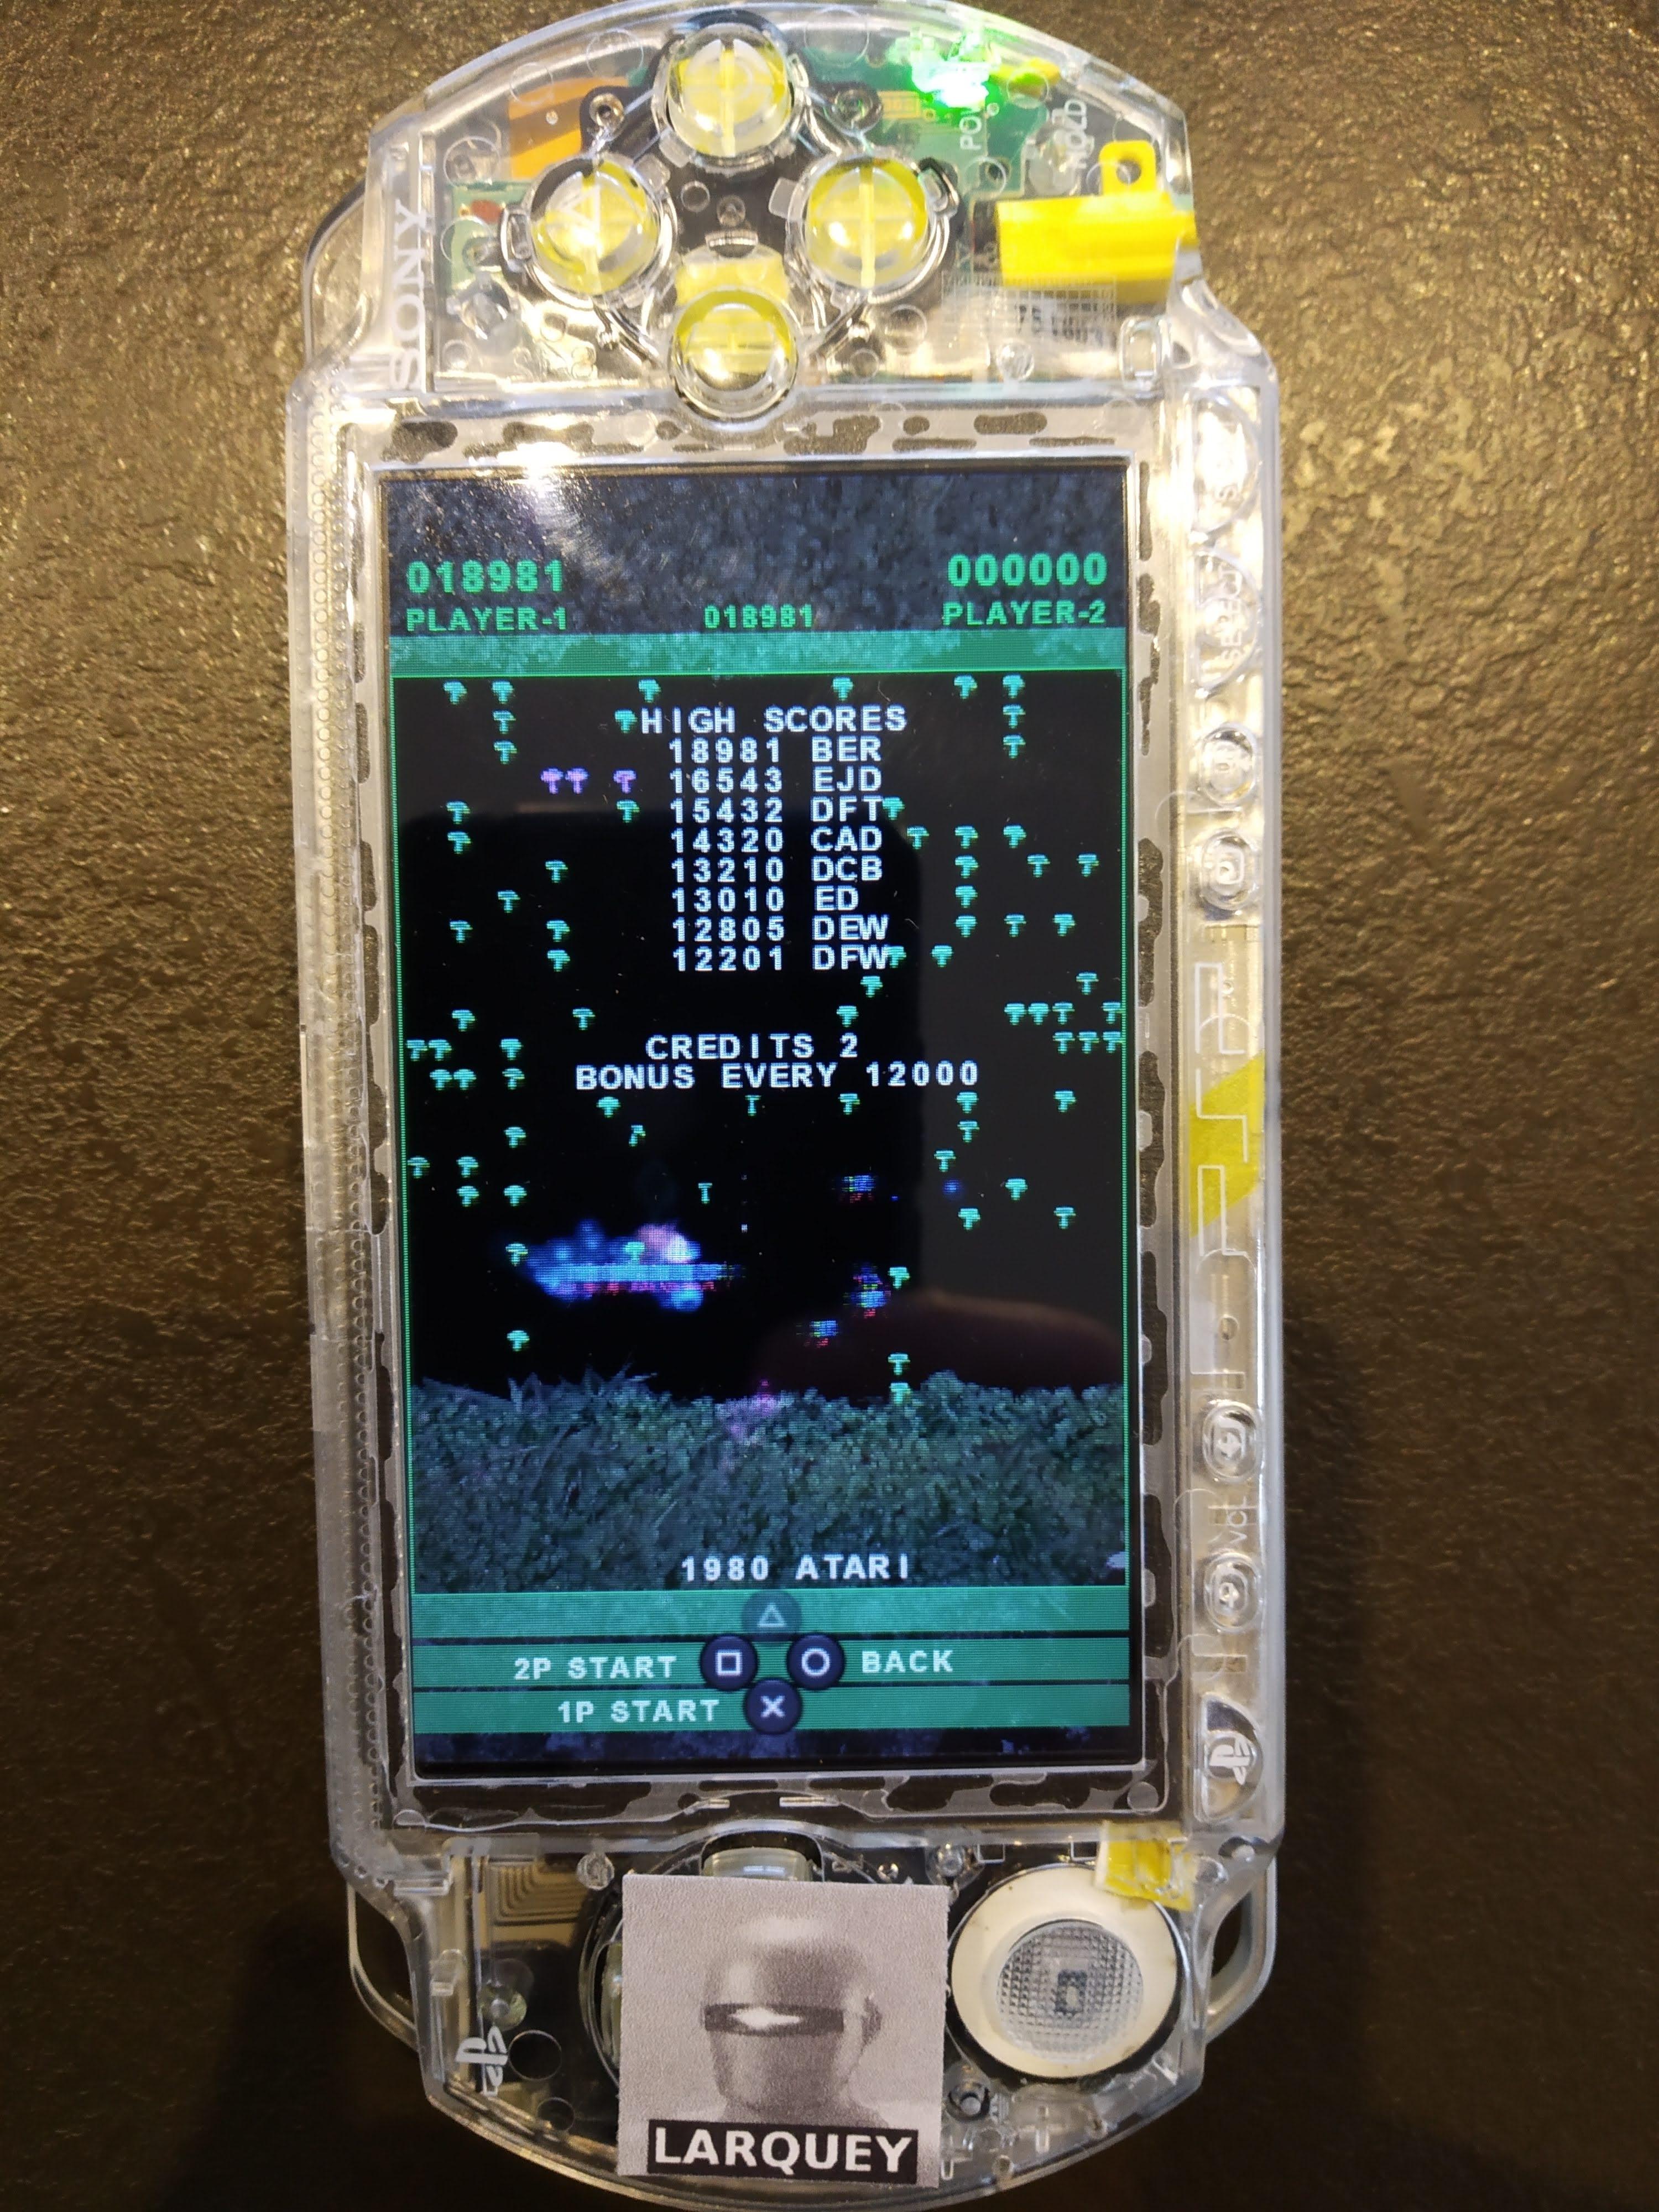 Larquey: Atari Classics Evolved: Centipede [Evolved] (PSP) 18,981 points on 2019-12-27 02:41:41